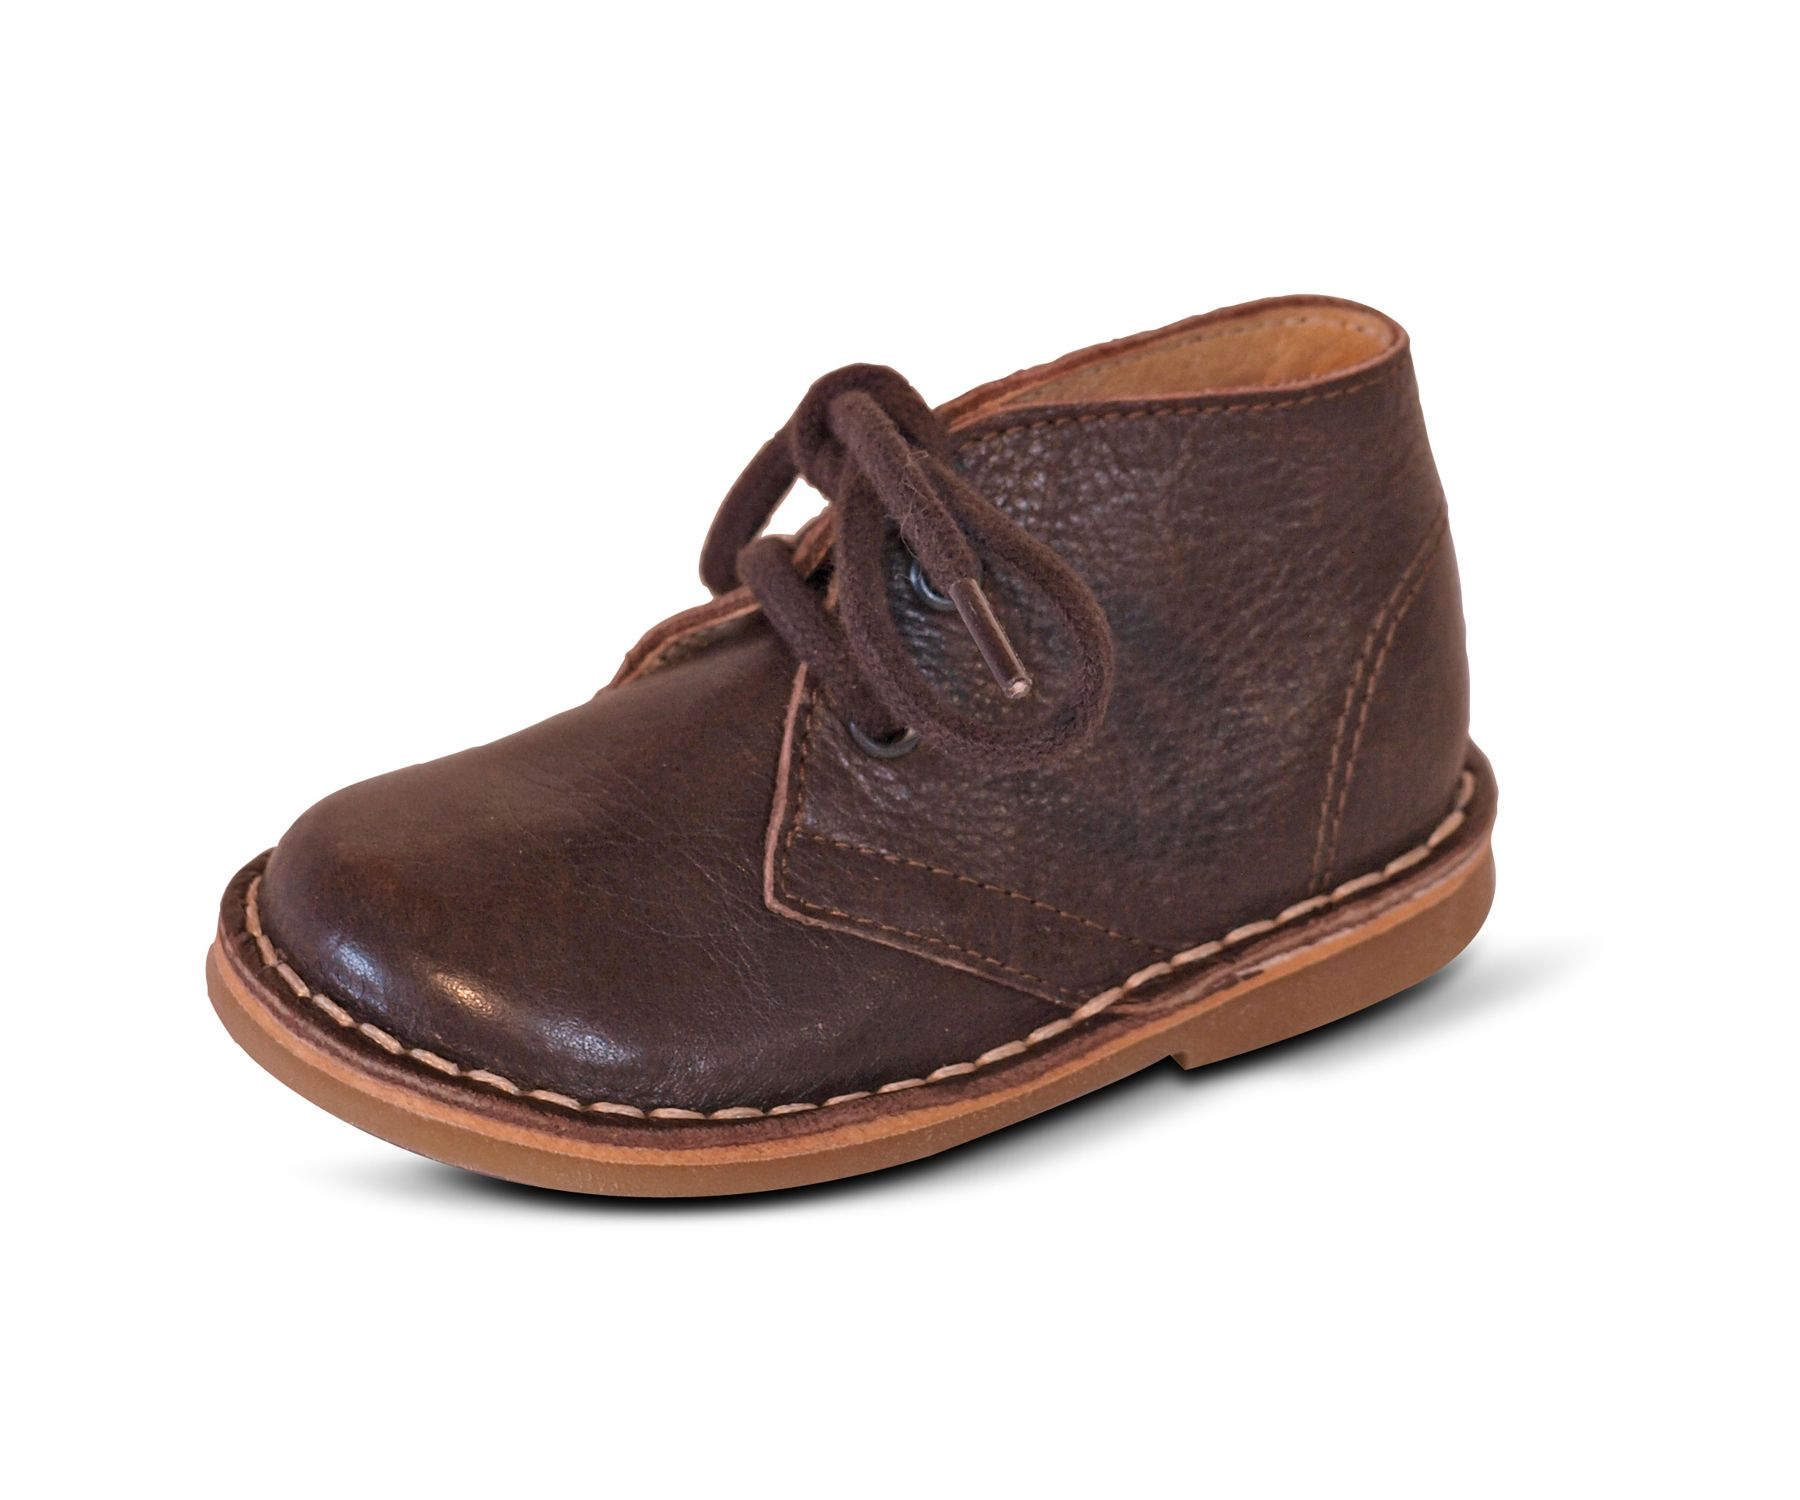 57ed66e0fca5a Petasil shoes | Kids shoes